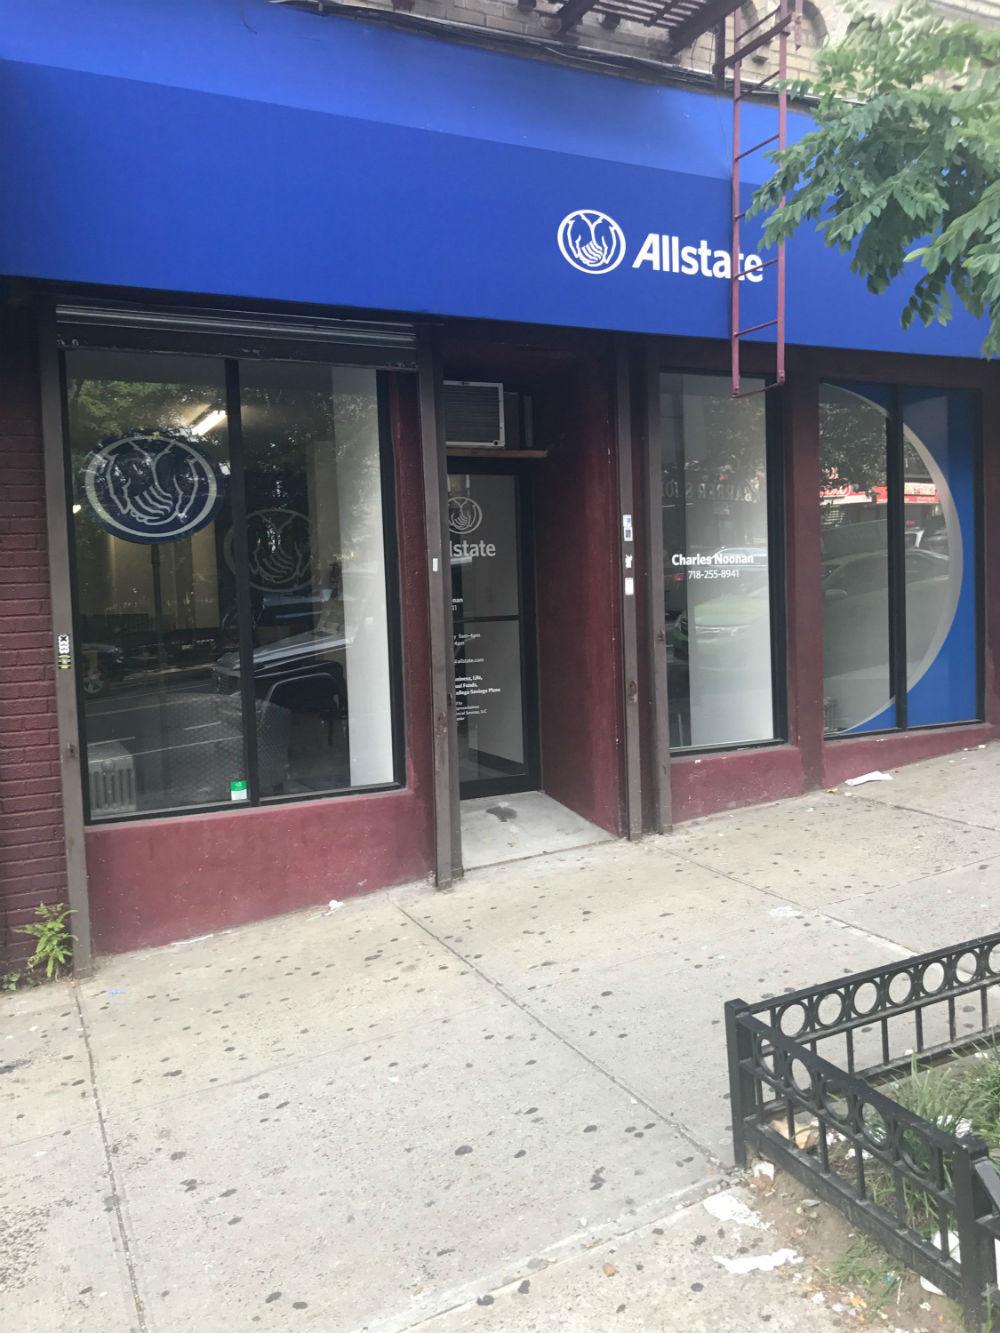 Allstate   Car Insurance in Bronx, NY - Charles Noonan